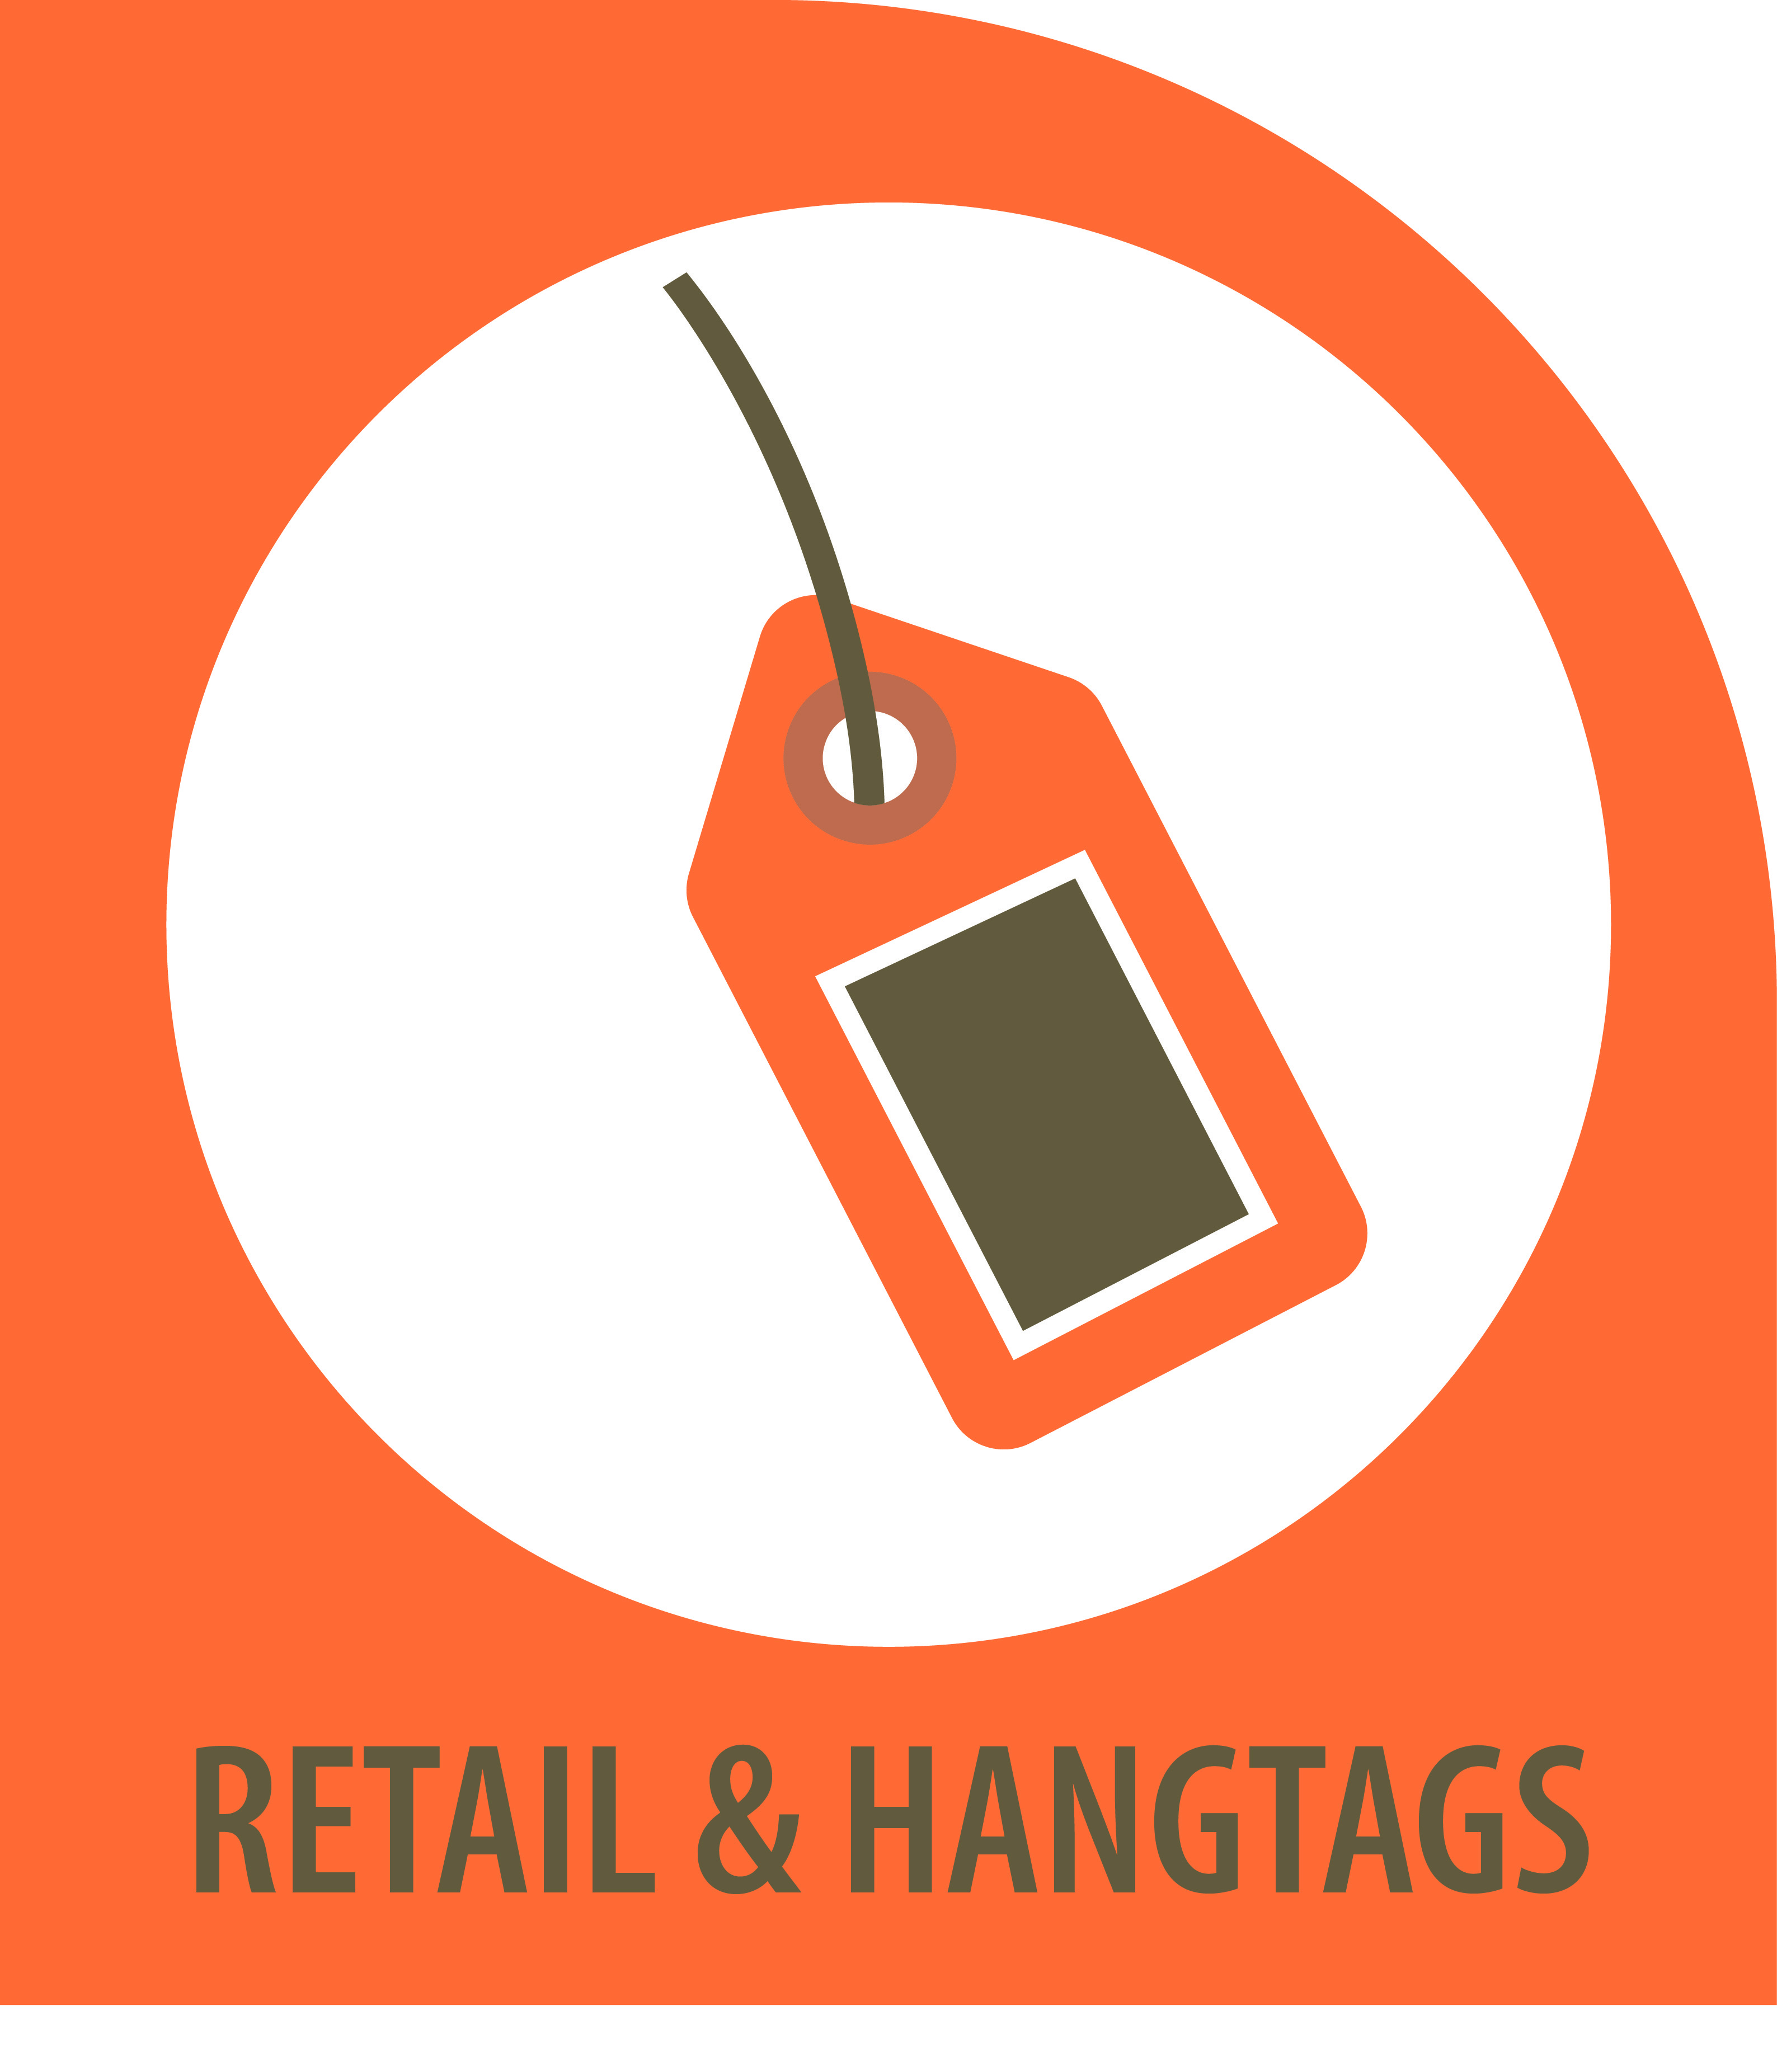 retailhangtags.jpg